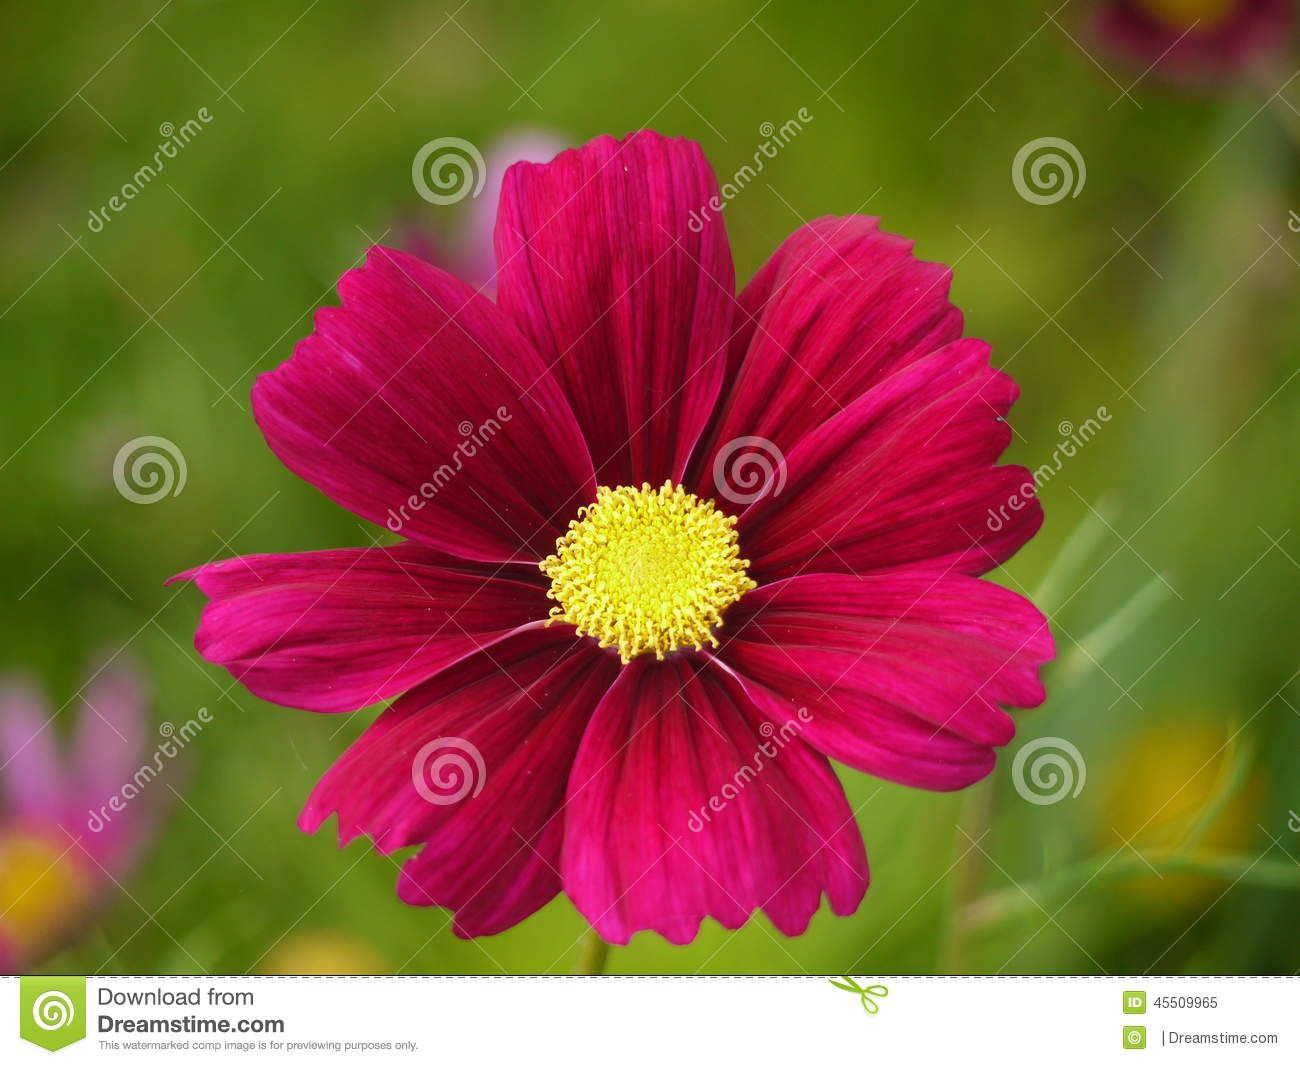 Dark pink cosmos flower tattoos pinterest cosmos cosmos dark pink cosmos flower mightylinksfo Image collections